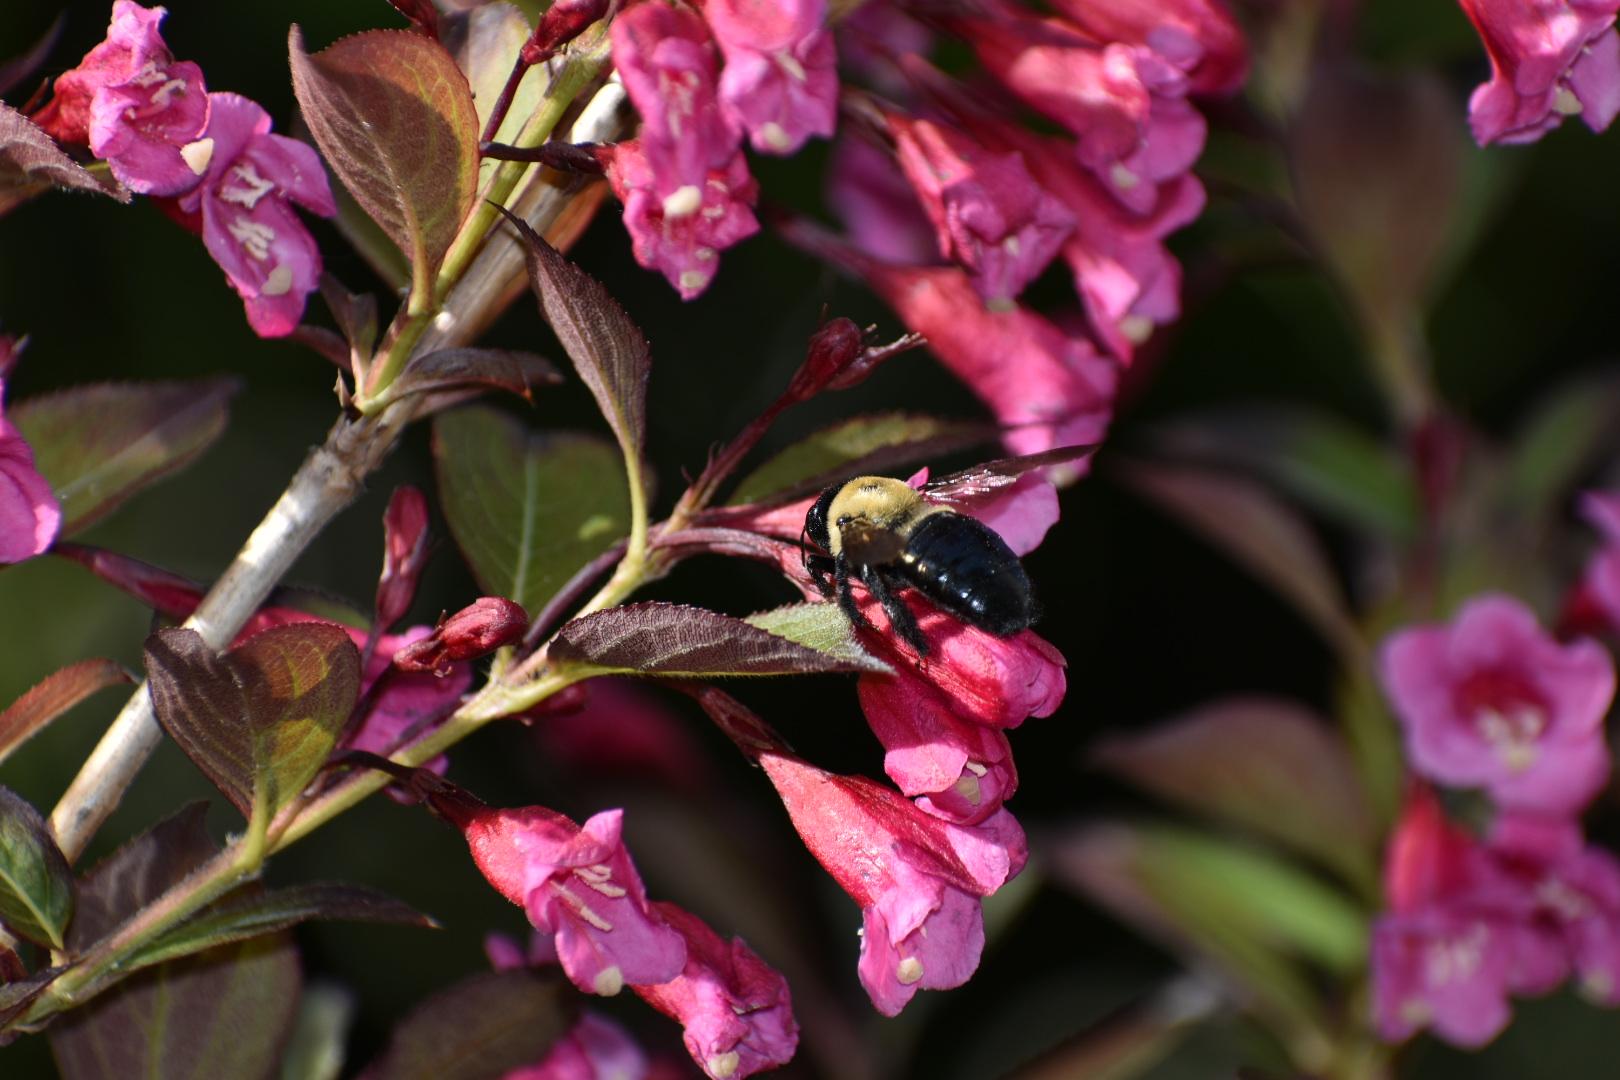 A bumble bee settles on Weigela Florida flowers, London